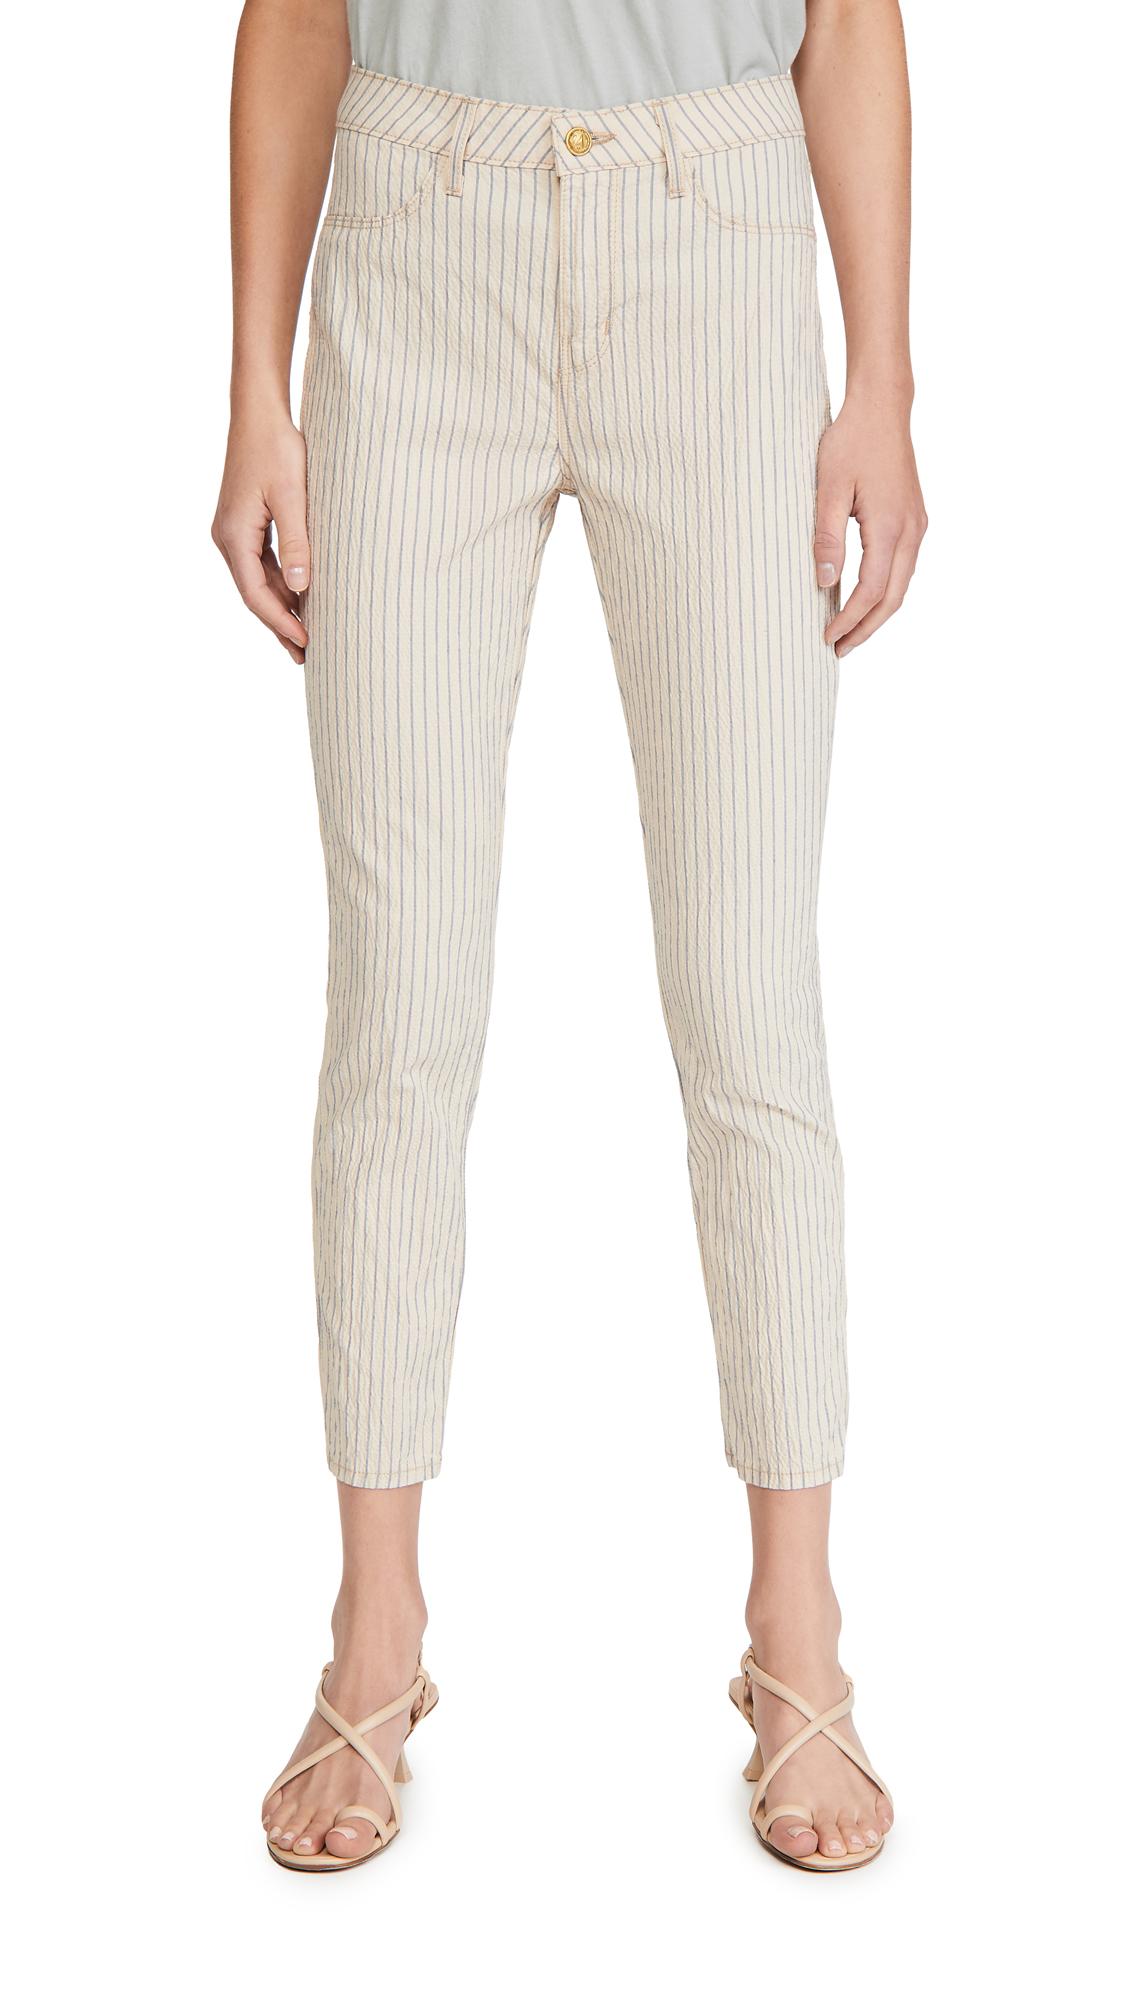 L'AGENCE Mandy H/R Skinny Jeans